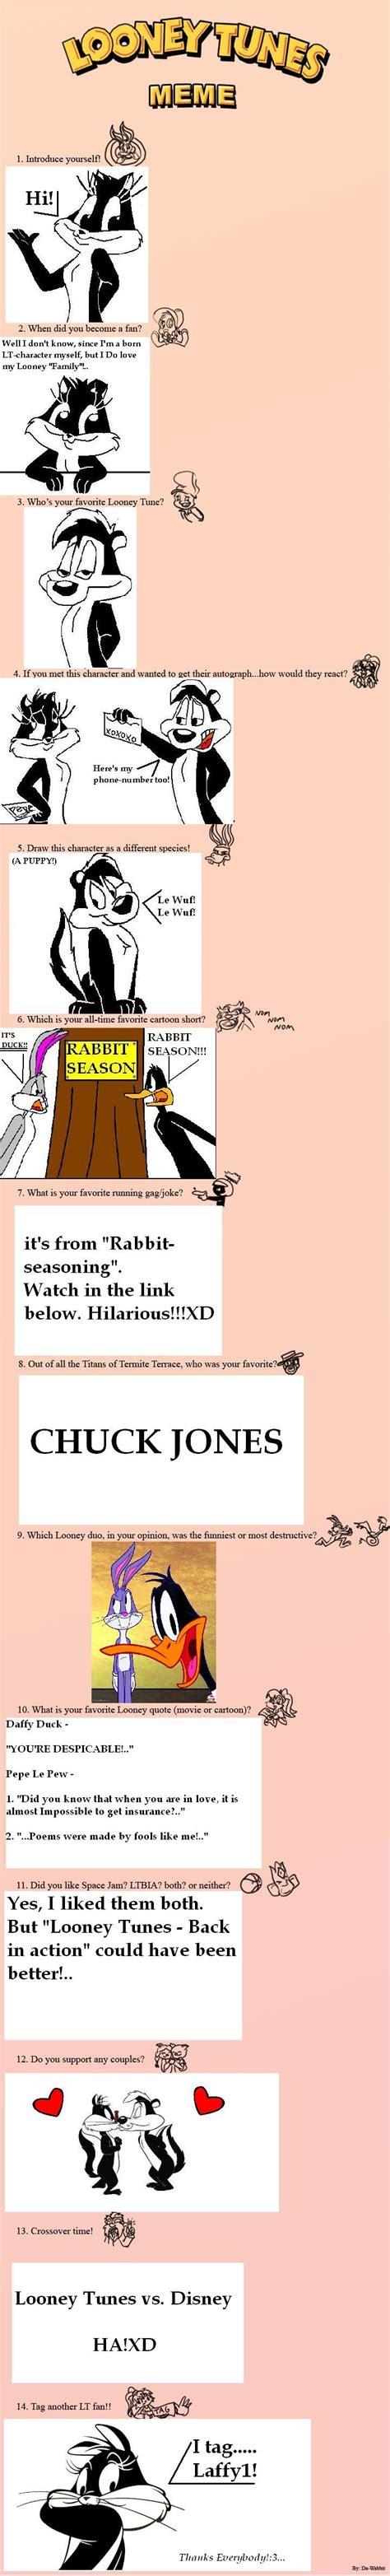 Looney Tunes Meme - my looney tunes meme by mizzamy15 on deviantart